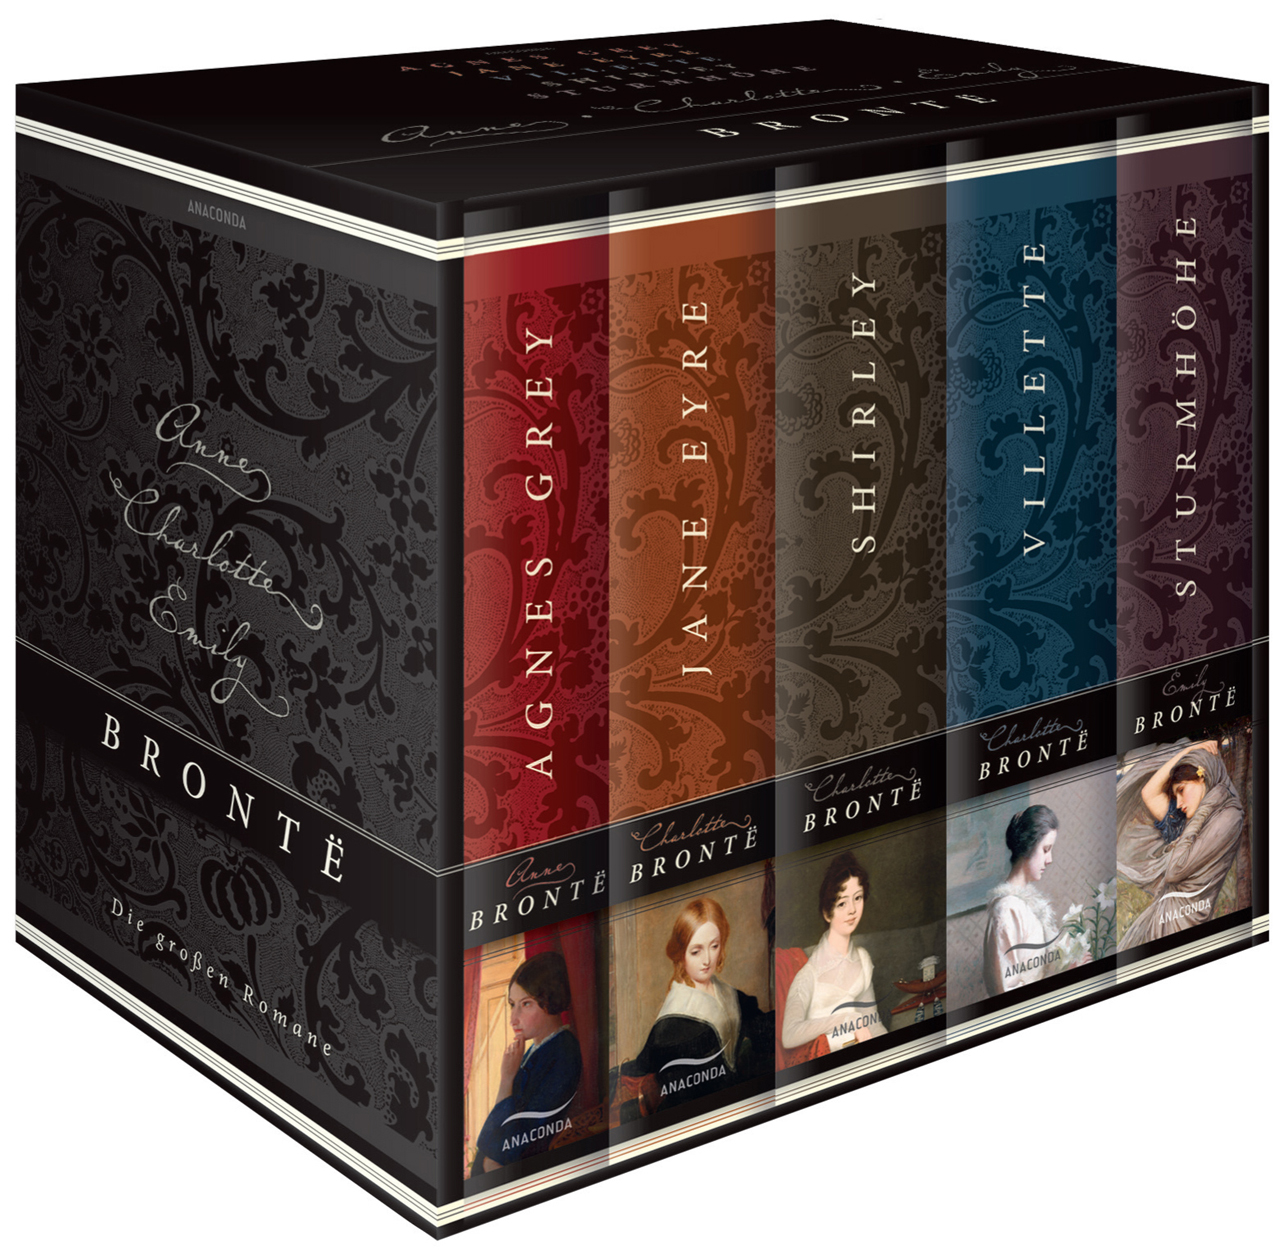 Brontë - Die großen Romane: Agnes Grey / Jane Eyre / Villette / Shirley / Sturmhöhe - Emily Brontë [5 Bände im Schuber]